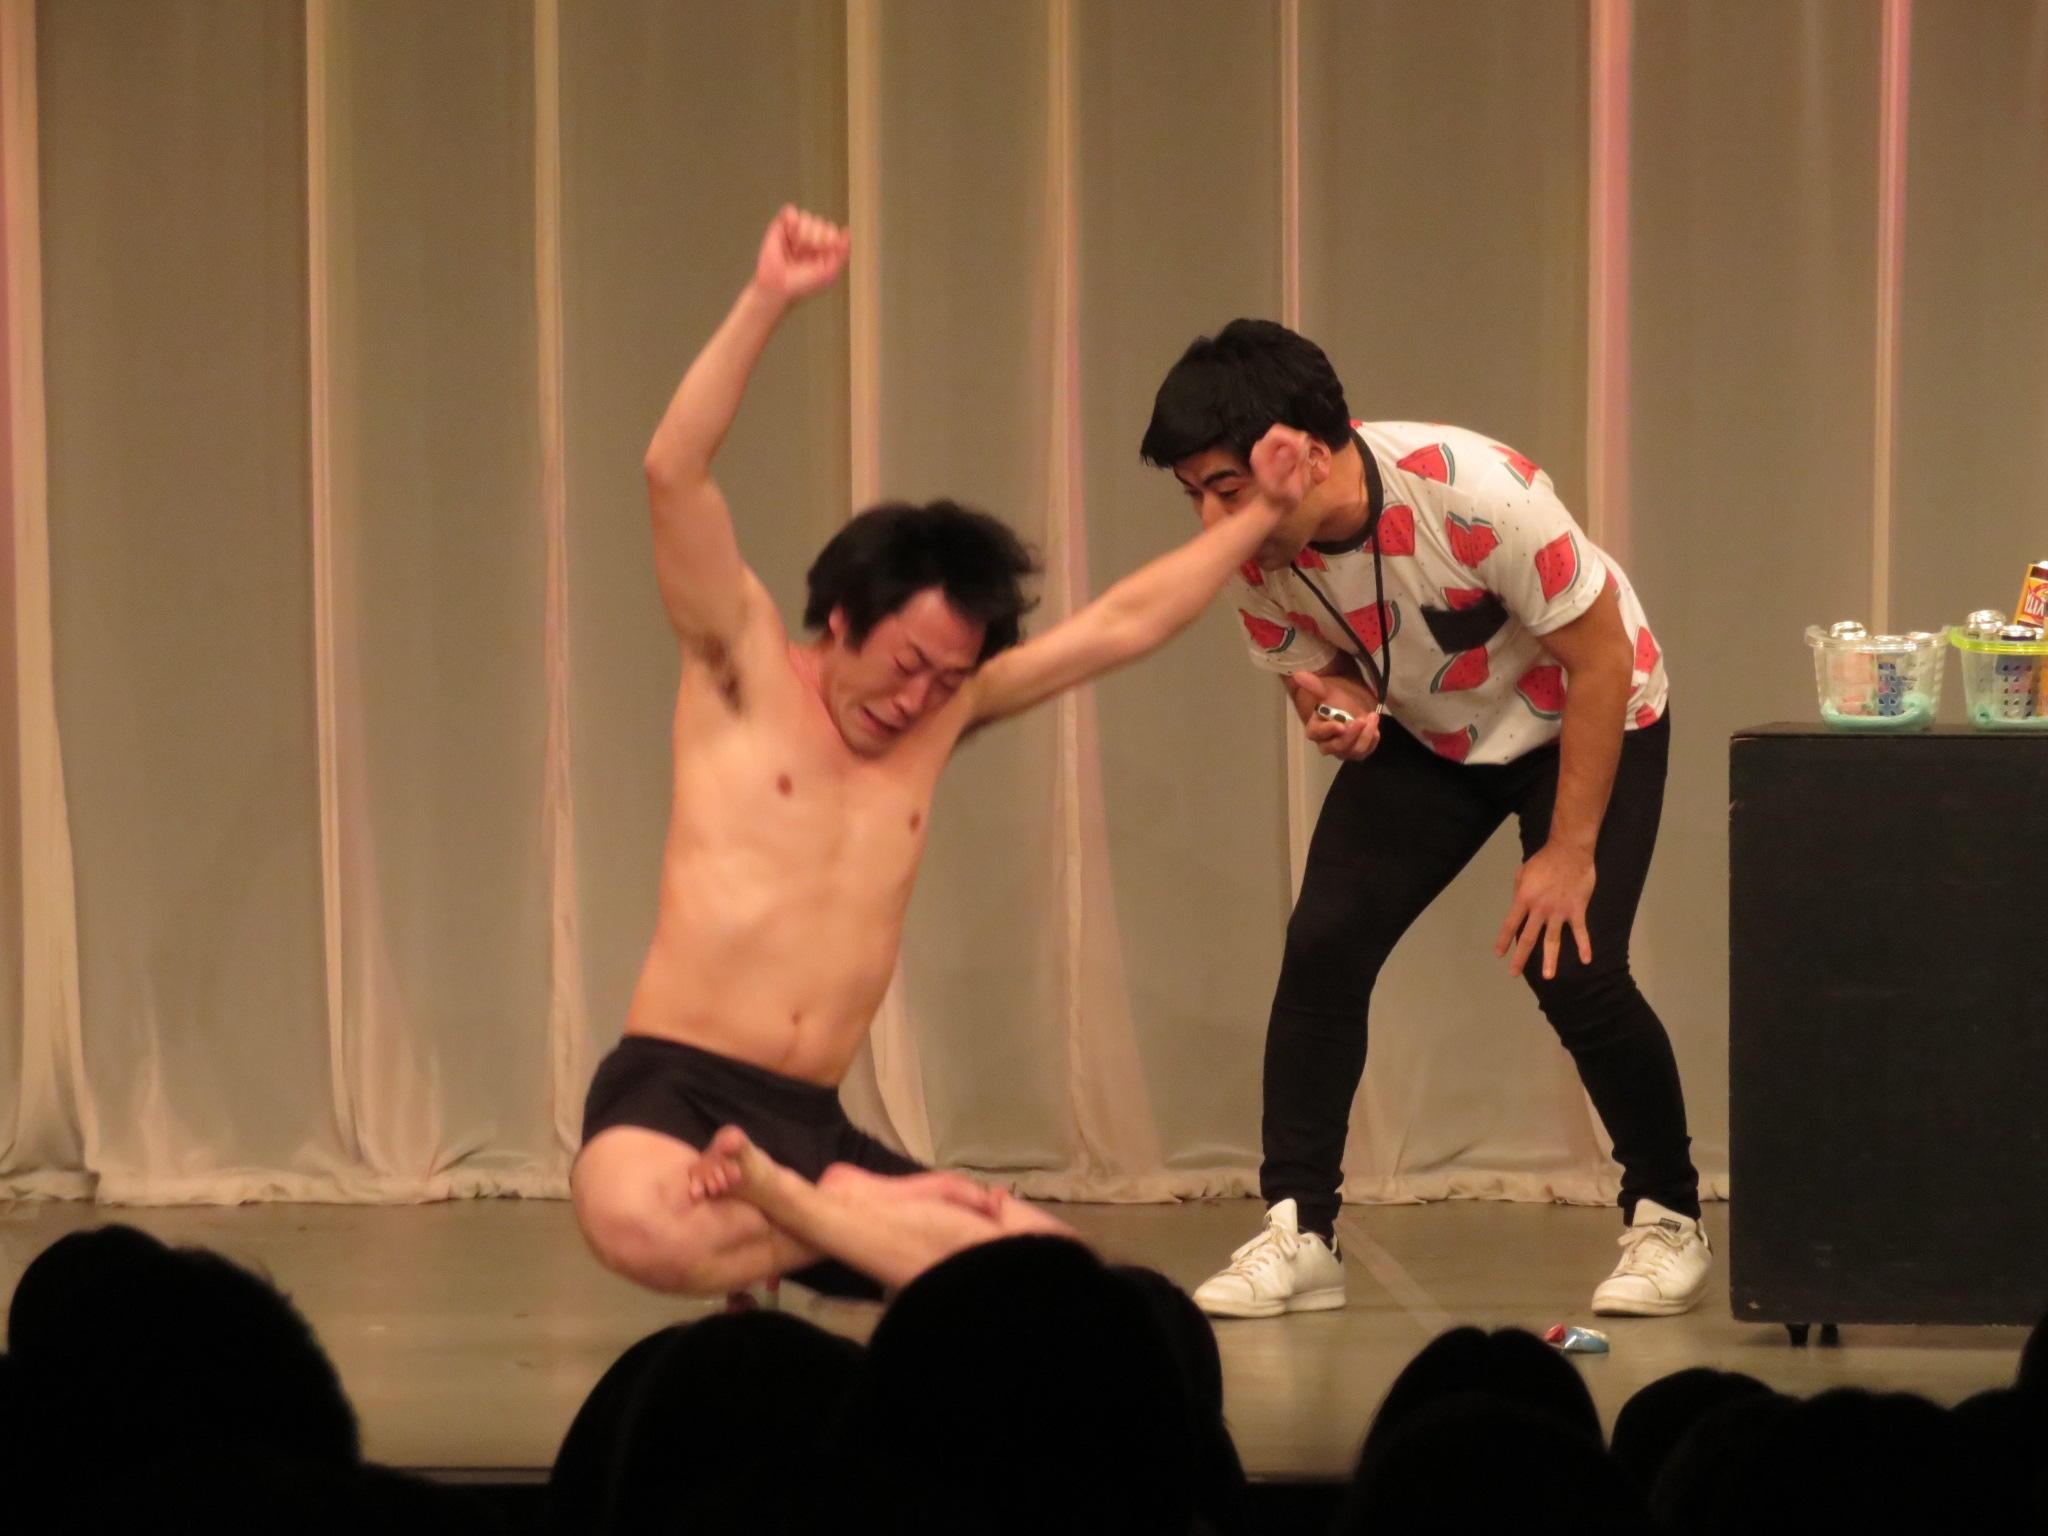 http://news.yoshimoto.co.jp/20180110191206-1be5f22ede249a73b35885340930bc5a3ff1b0a7.jpg